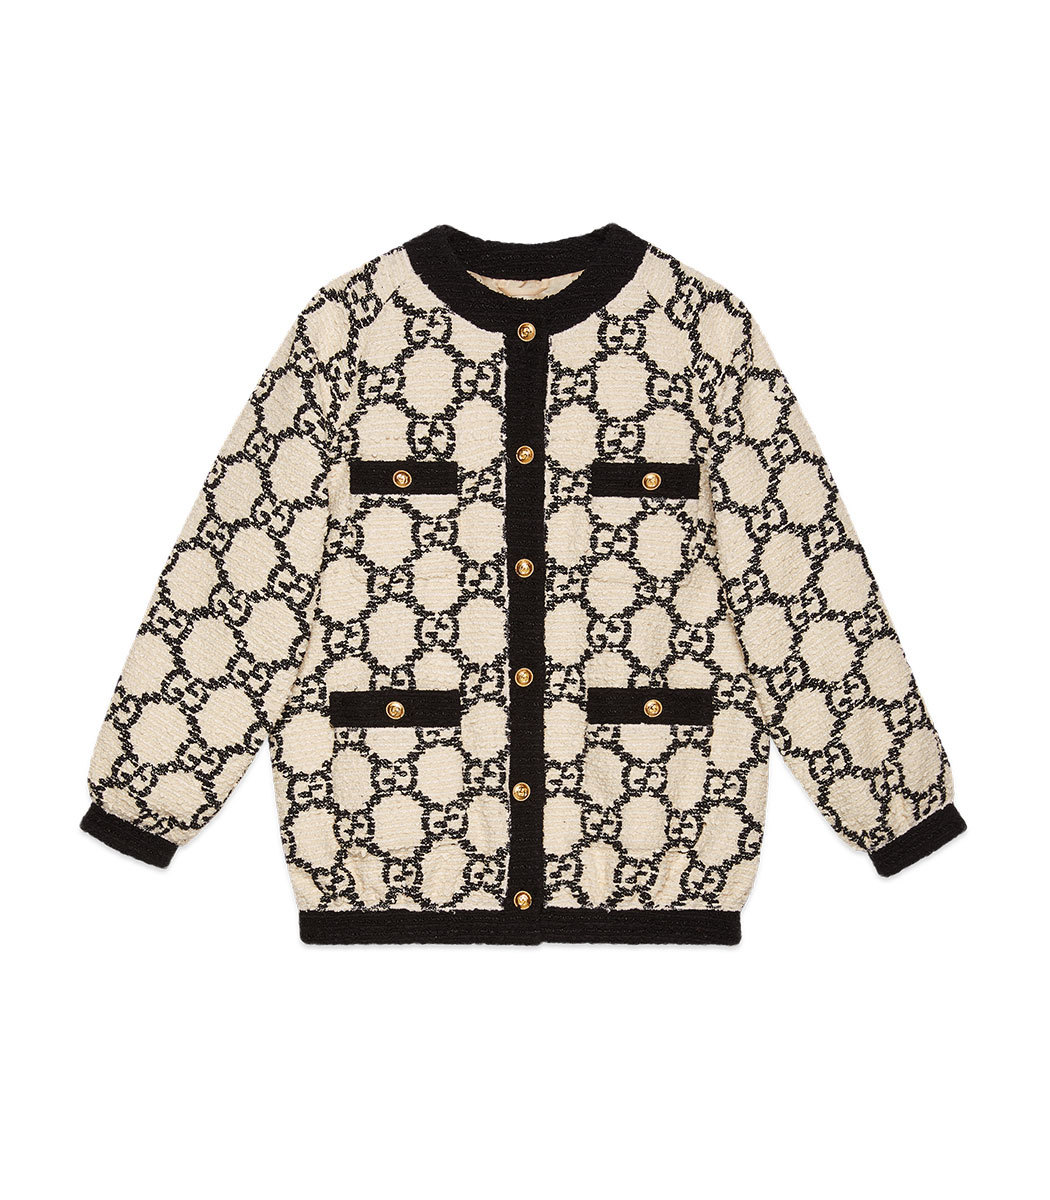 efa288f27 Gucci GG Tweed Oversize Bomber - ShopBAZAAR